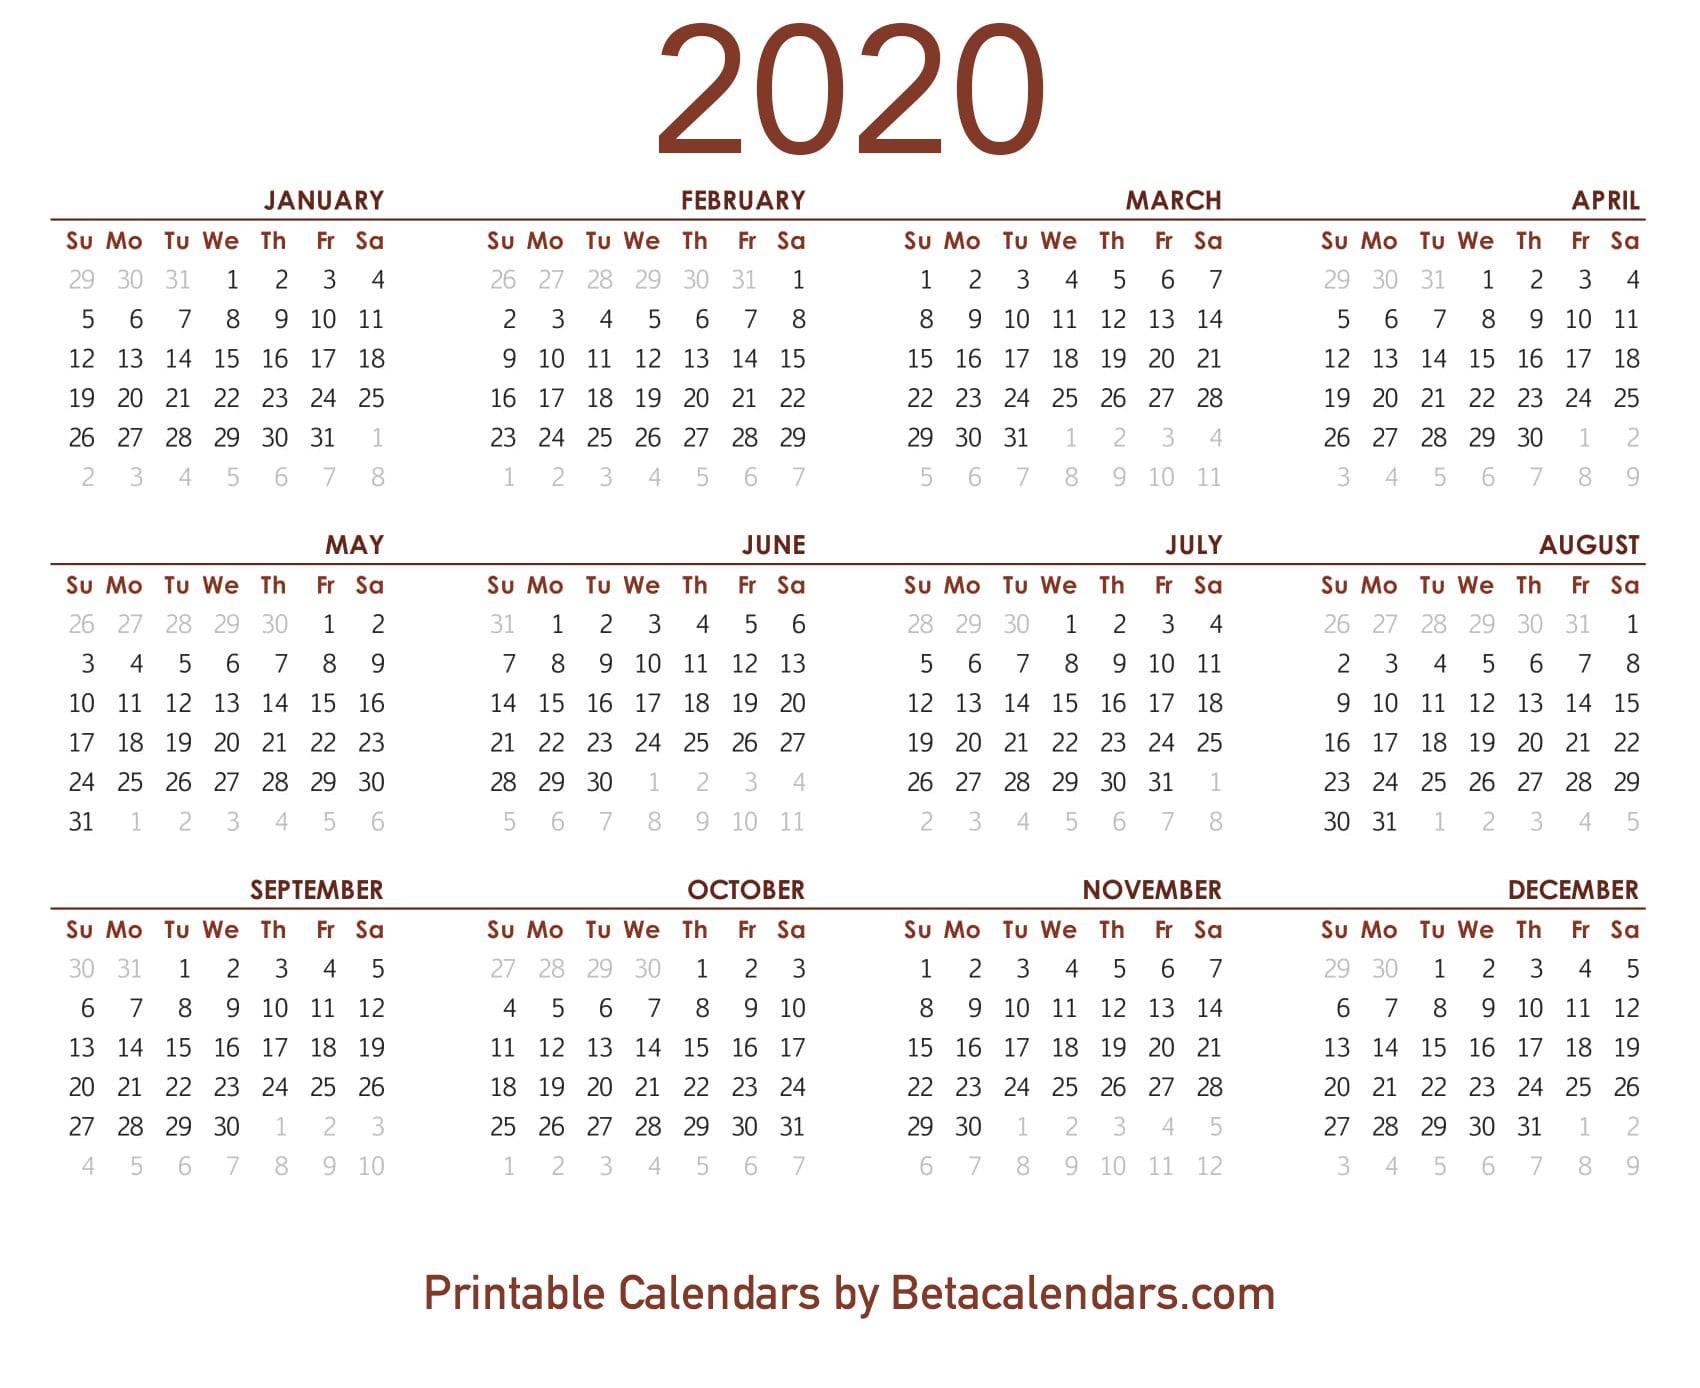 2020 Calendar - Free Printable Yearly Calendar 2020 throughout Tanduay Calendar 2020